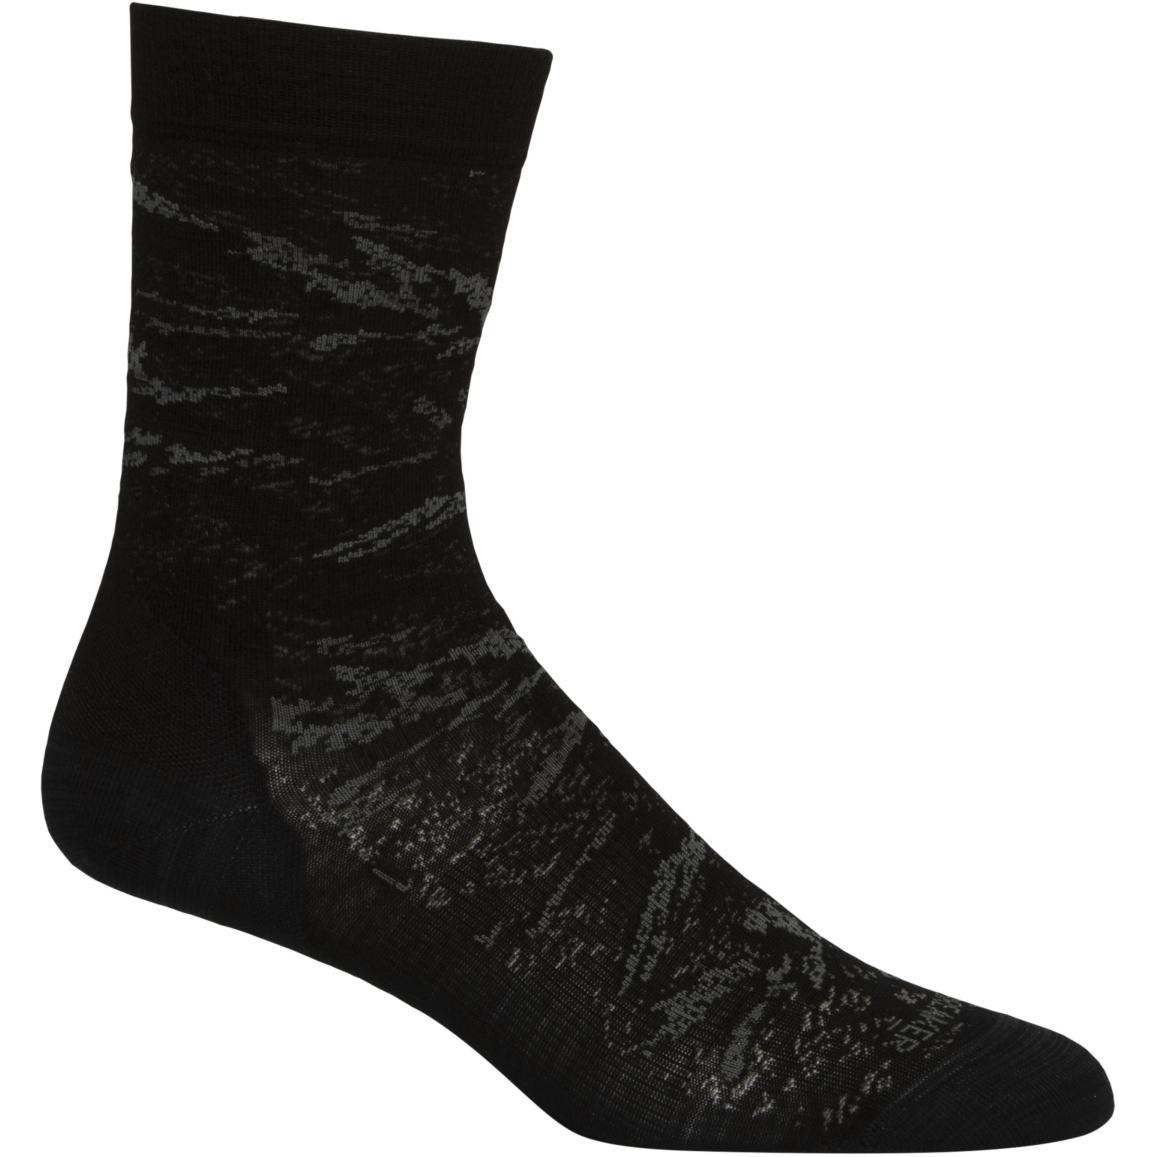 Icebreaker Lifestyle Fine Gauge Crew IB Glacier Damen Socken - Black